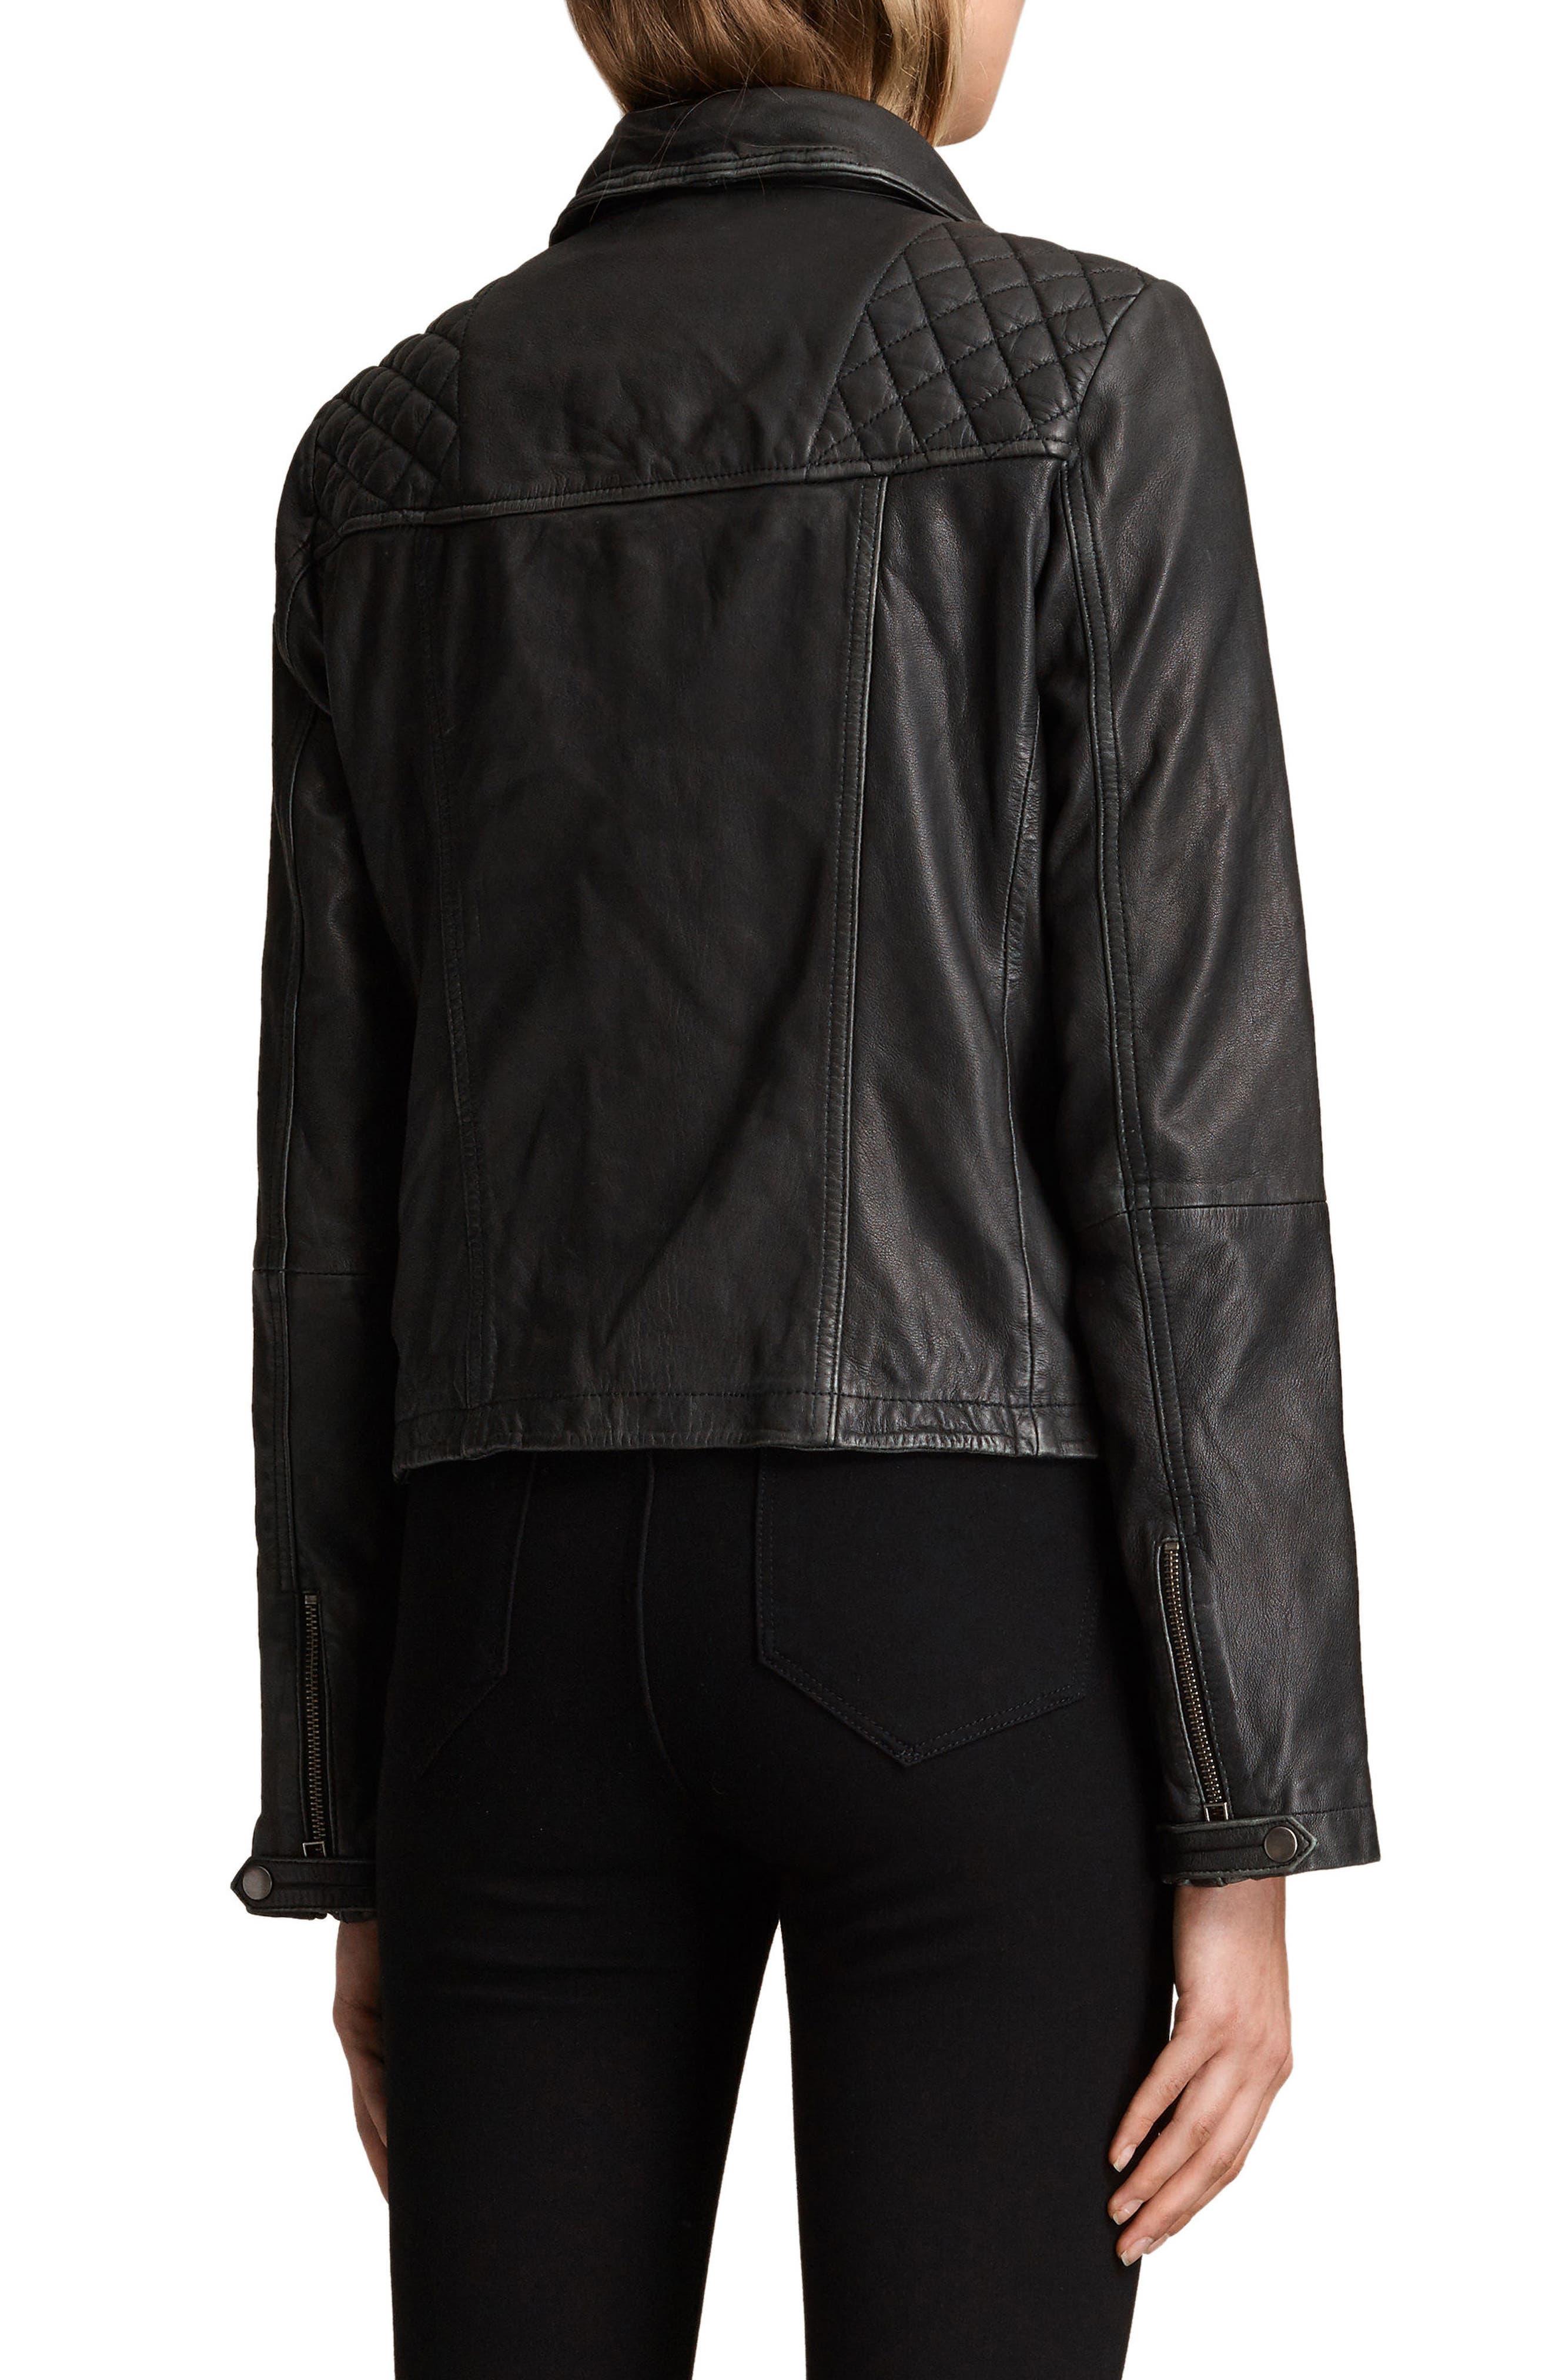 Cargo Leather Biker Jacket,                             Alternate thumbnail 2, color,                             Black/ Grey